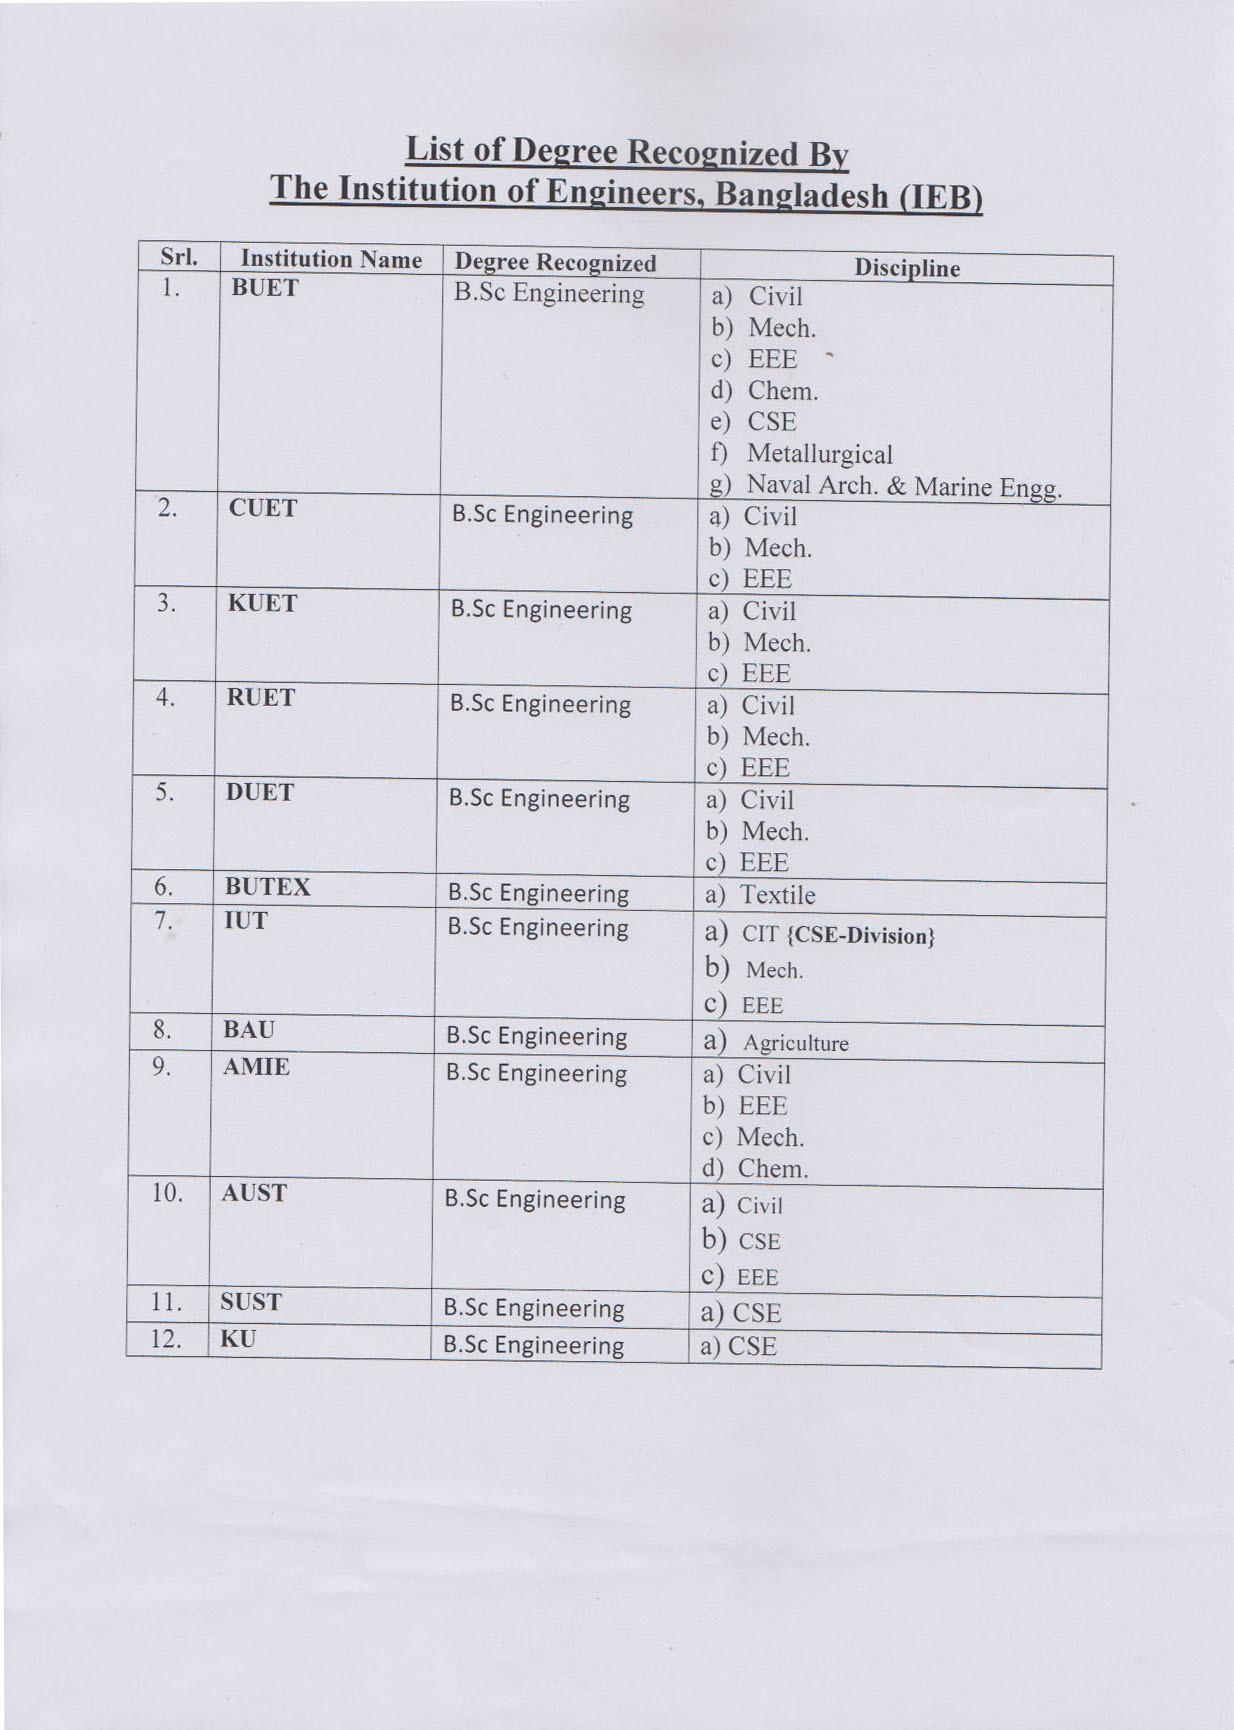 Nanakshahi Calendar March 2019 Recientes the Institution Of Engineers Bangladesh Ieb Of Nanakshahi Calendar March 2019 Más Recientes School Year Calendars School Year Calendars